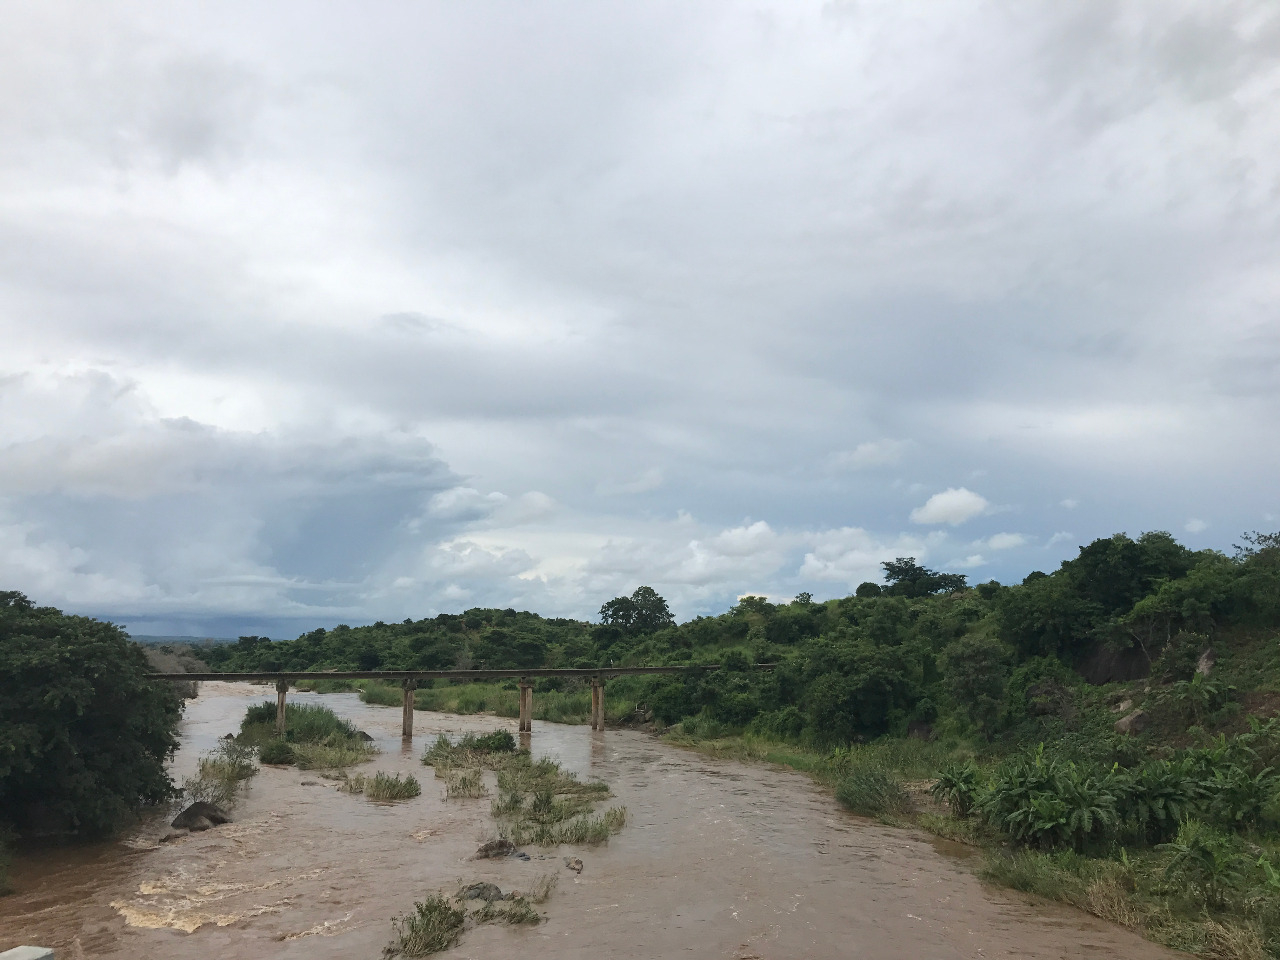 Bua river leading to Lake Malawi